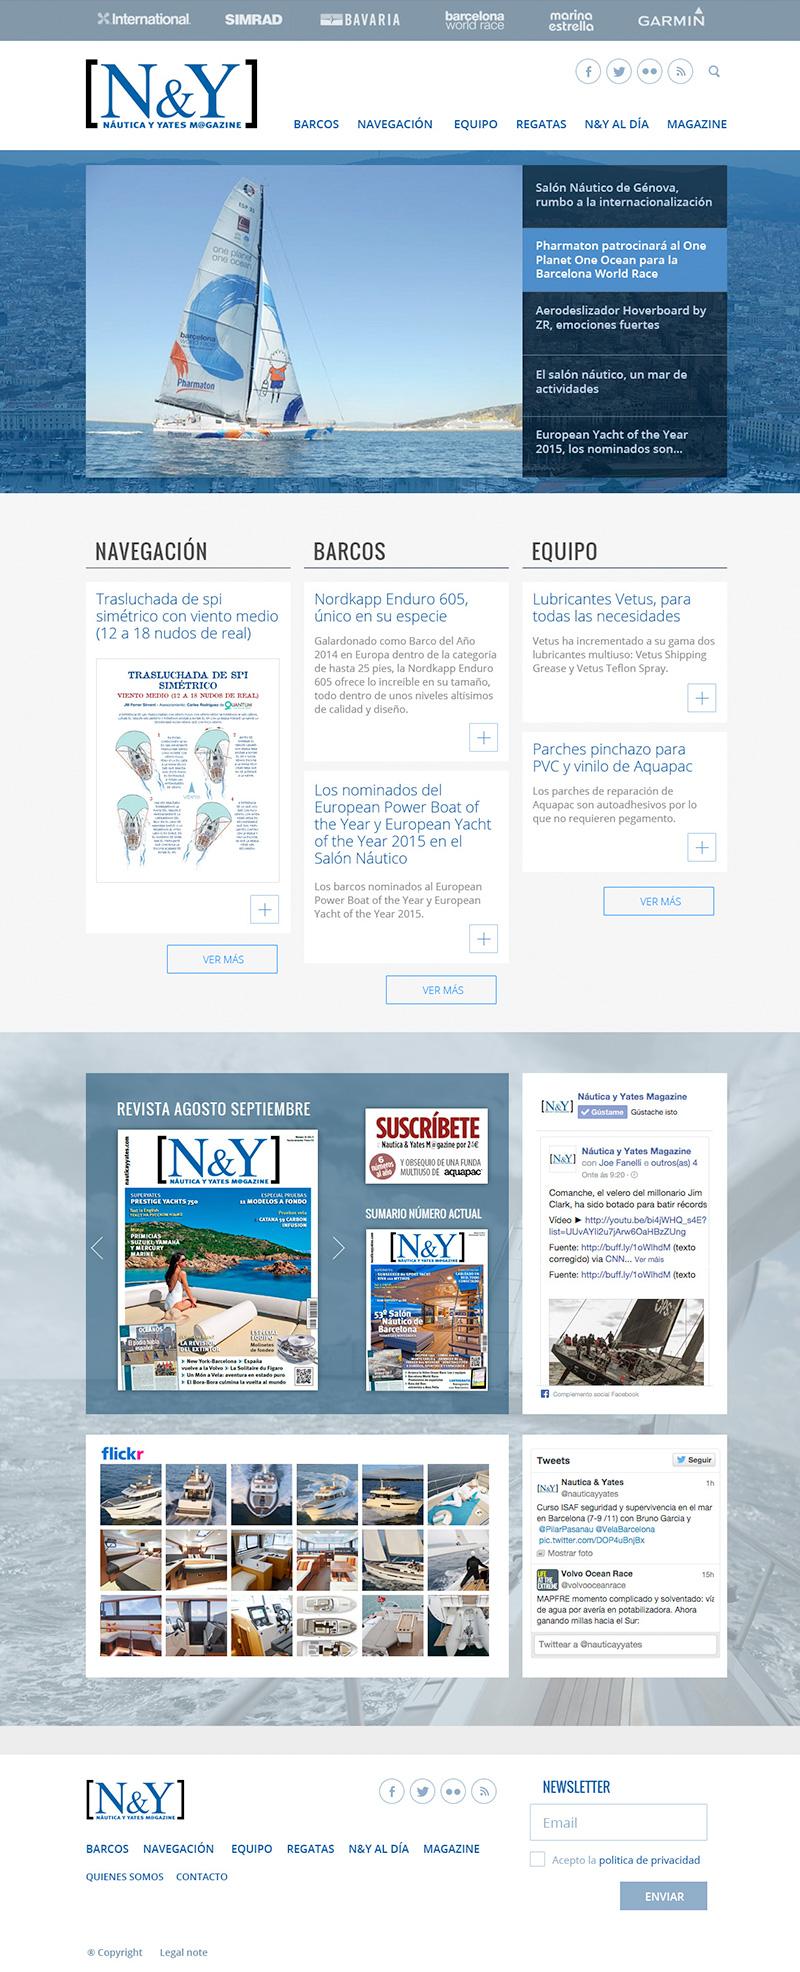 Náutica y Yates magazine